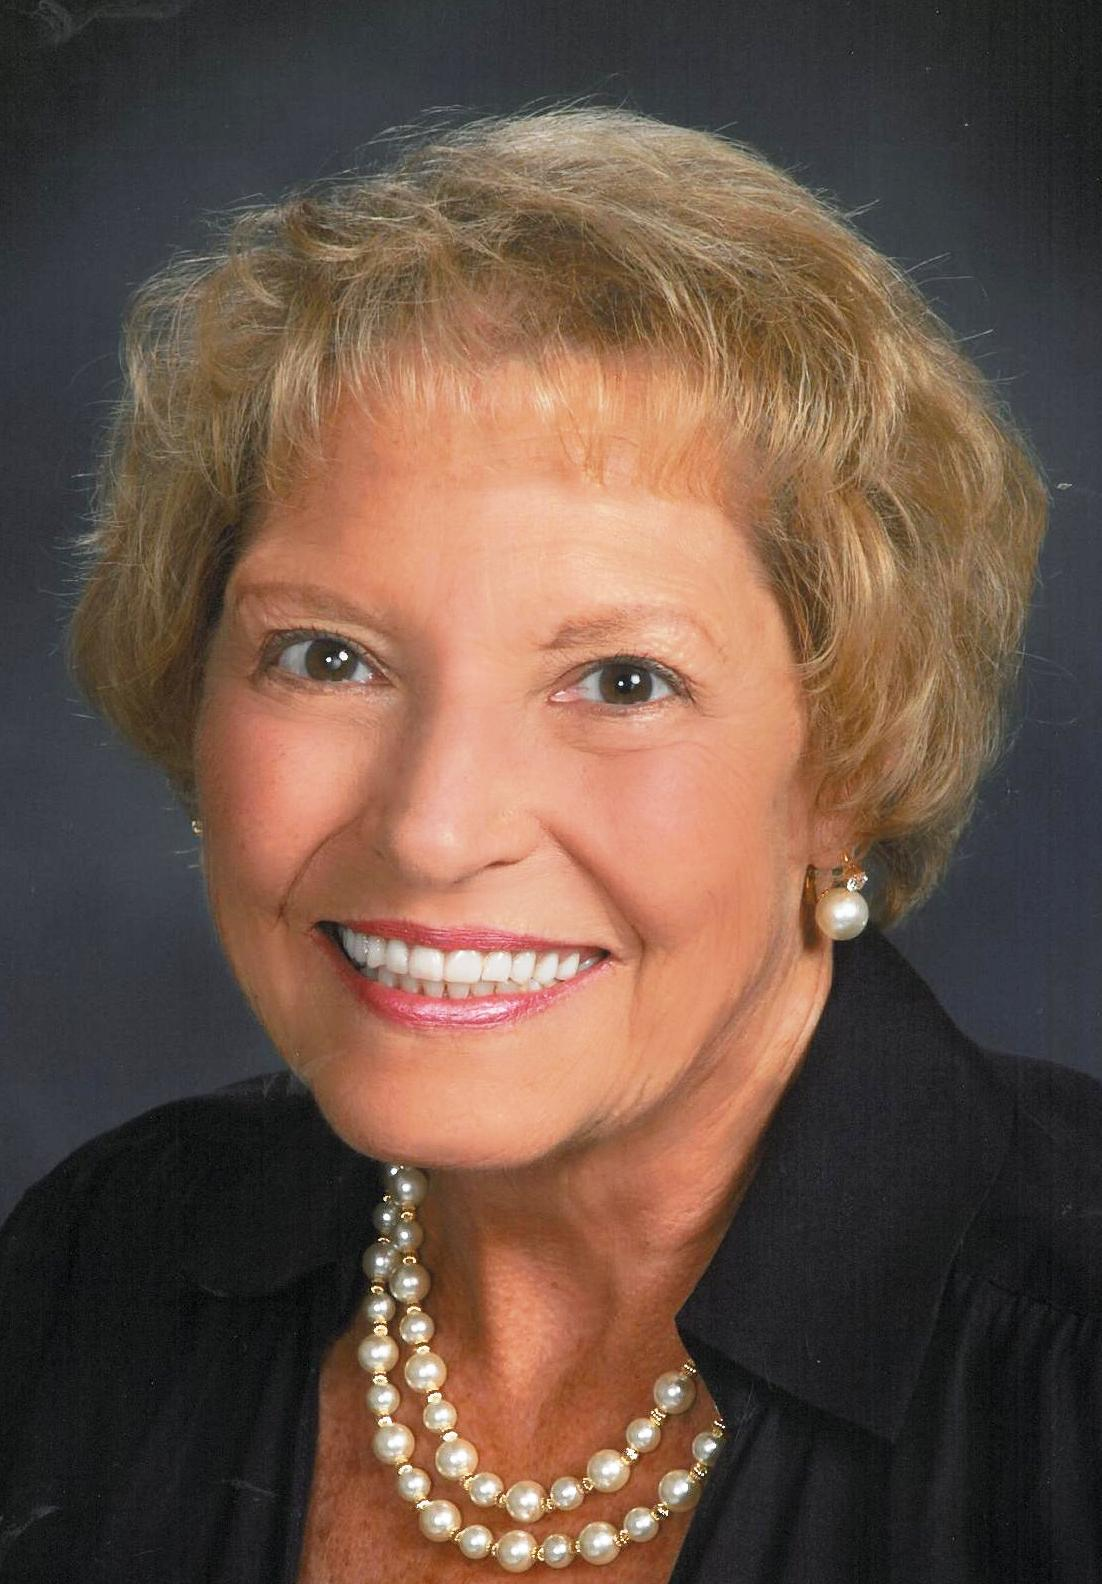 Margaret Rose Shaughnessy